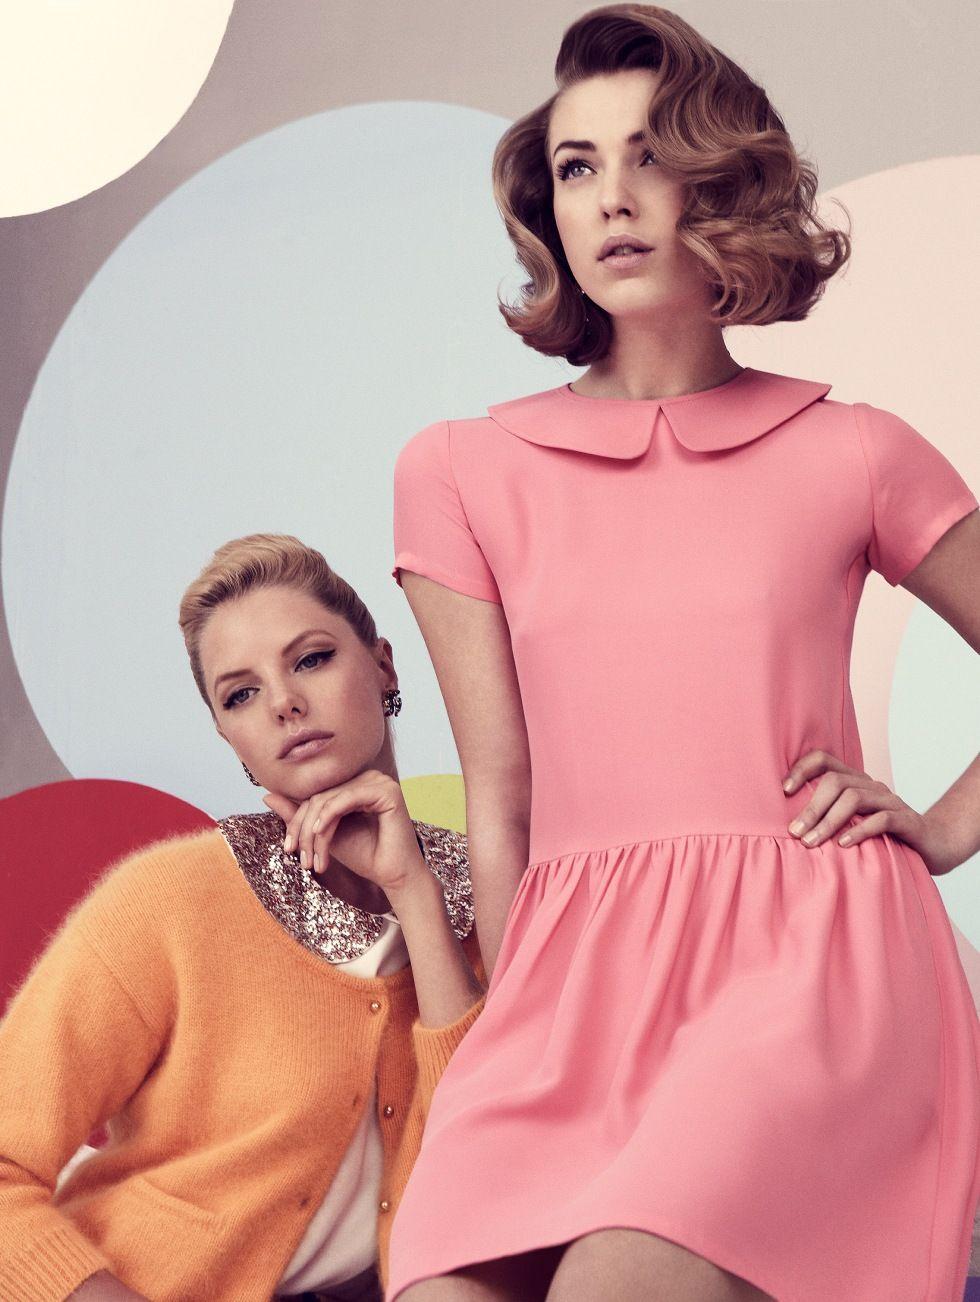 50's fashion, pink, pink dress, 1950's, Greta, Damernas Värld, hair style, vintage, vintage hair style